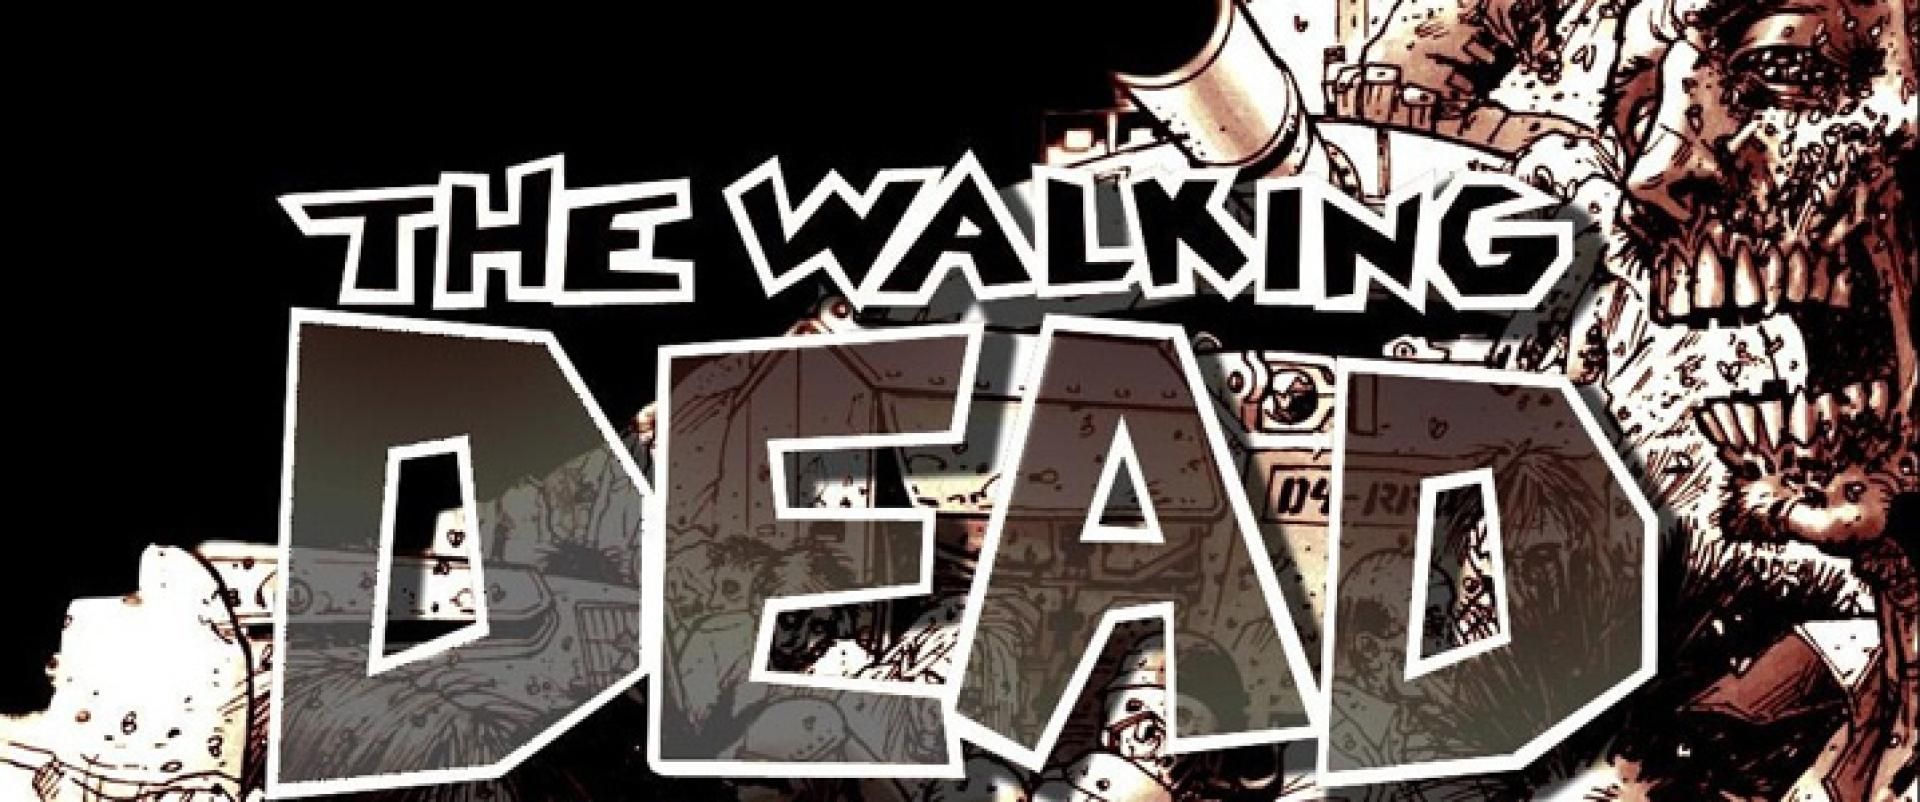 The Walking Dead: 3. kötet